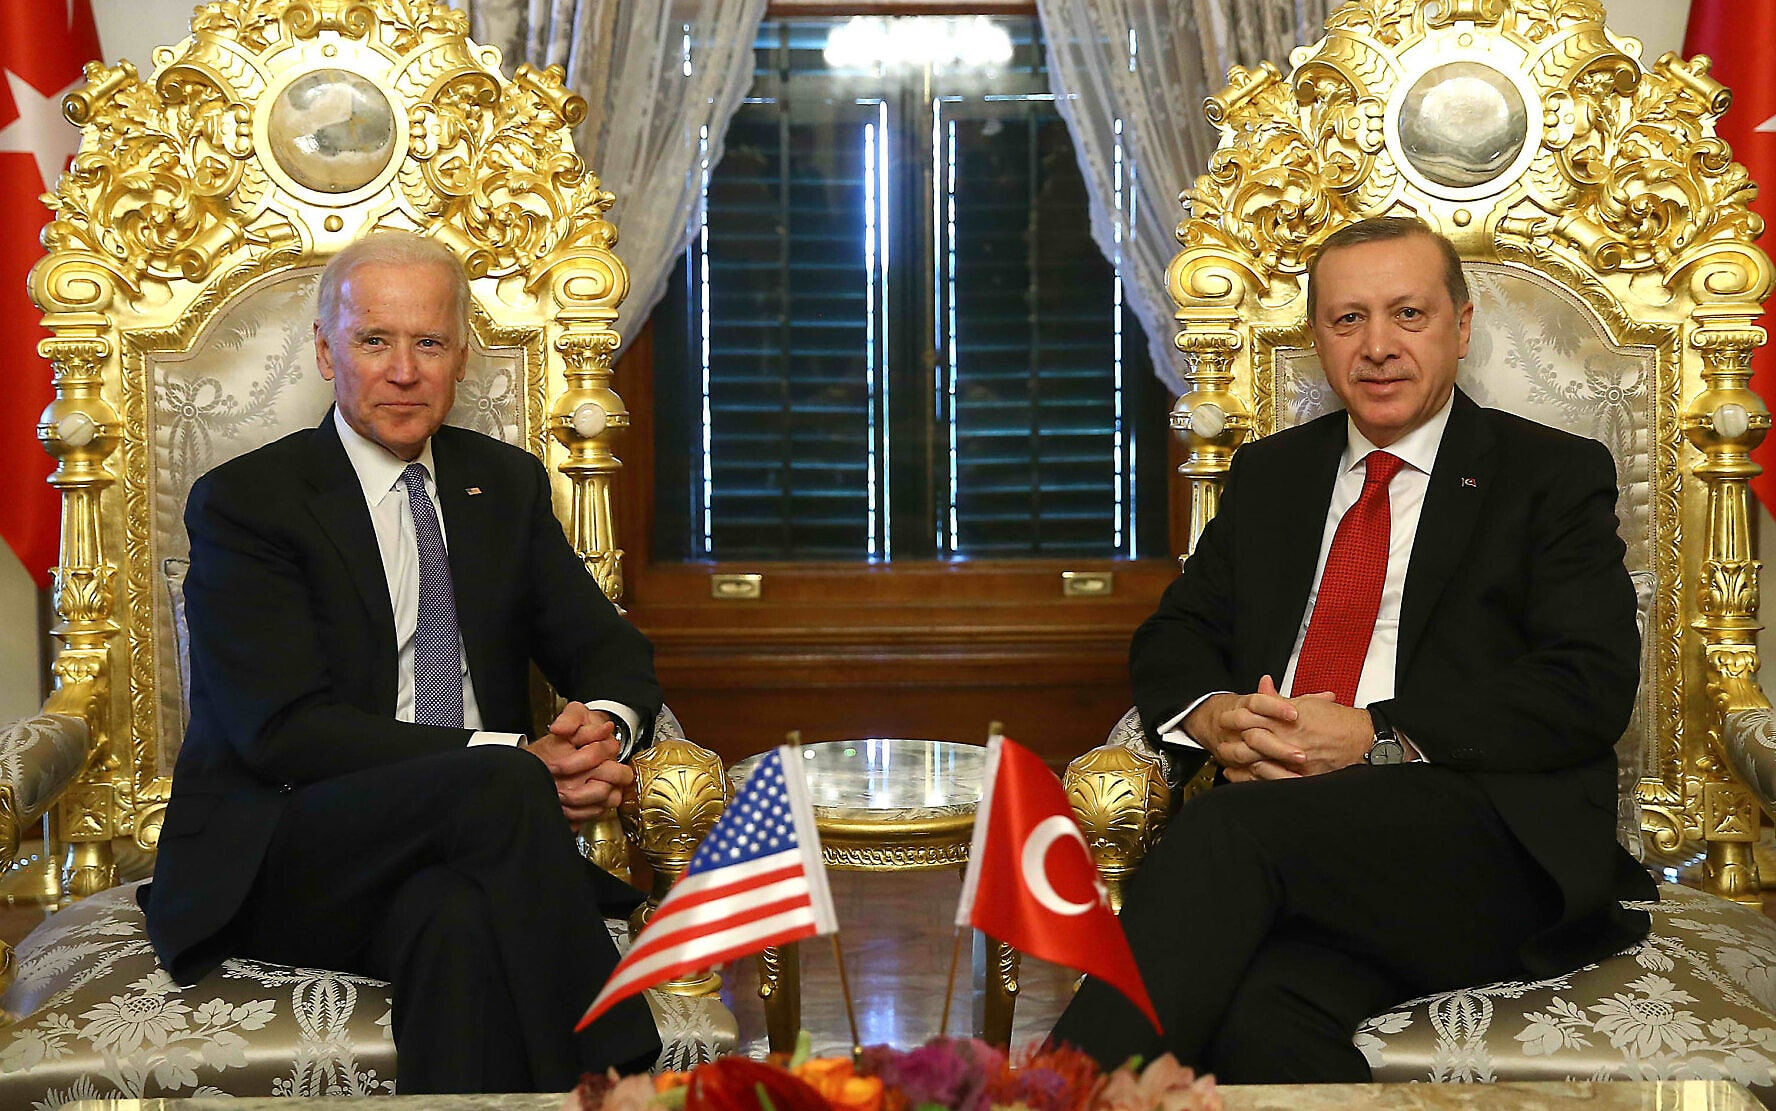 The former Vice President of Barack Obama and the President of the Republic of Turkey Recep Tayyip Erdogan